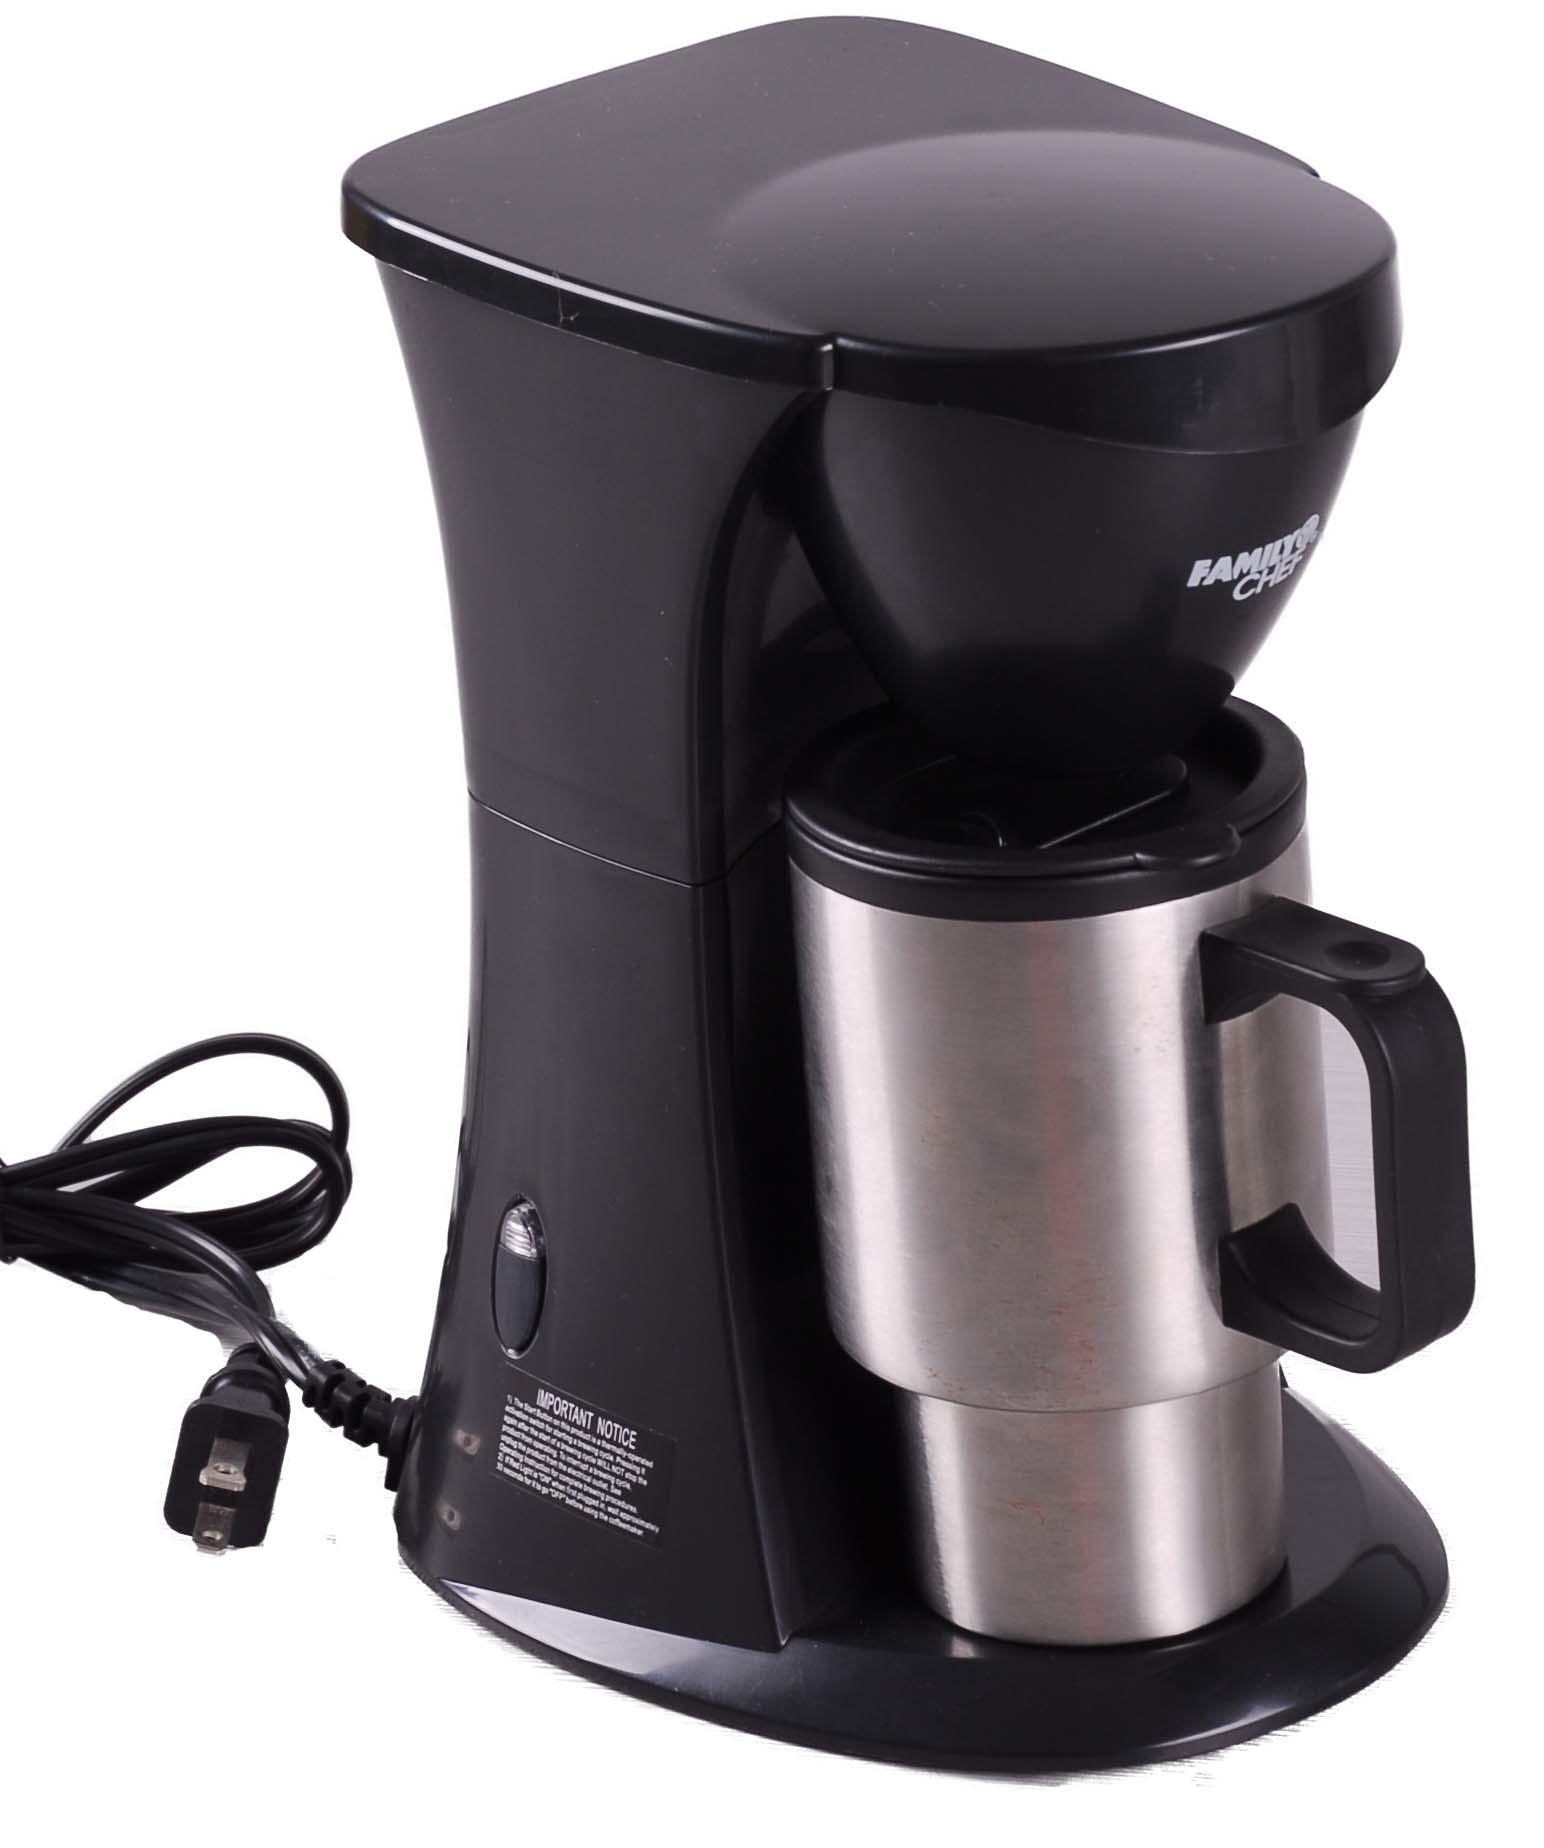 Ninja Cf086 Thermal Coffee Bar Coffee Makers For The Home Shop - Coffeemaker